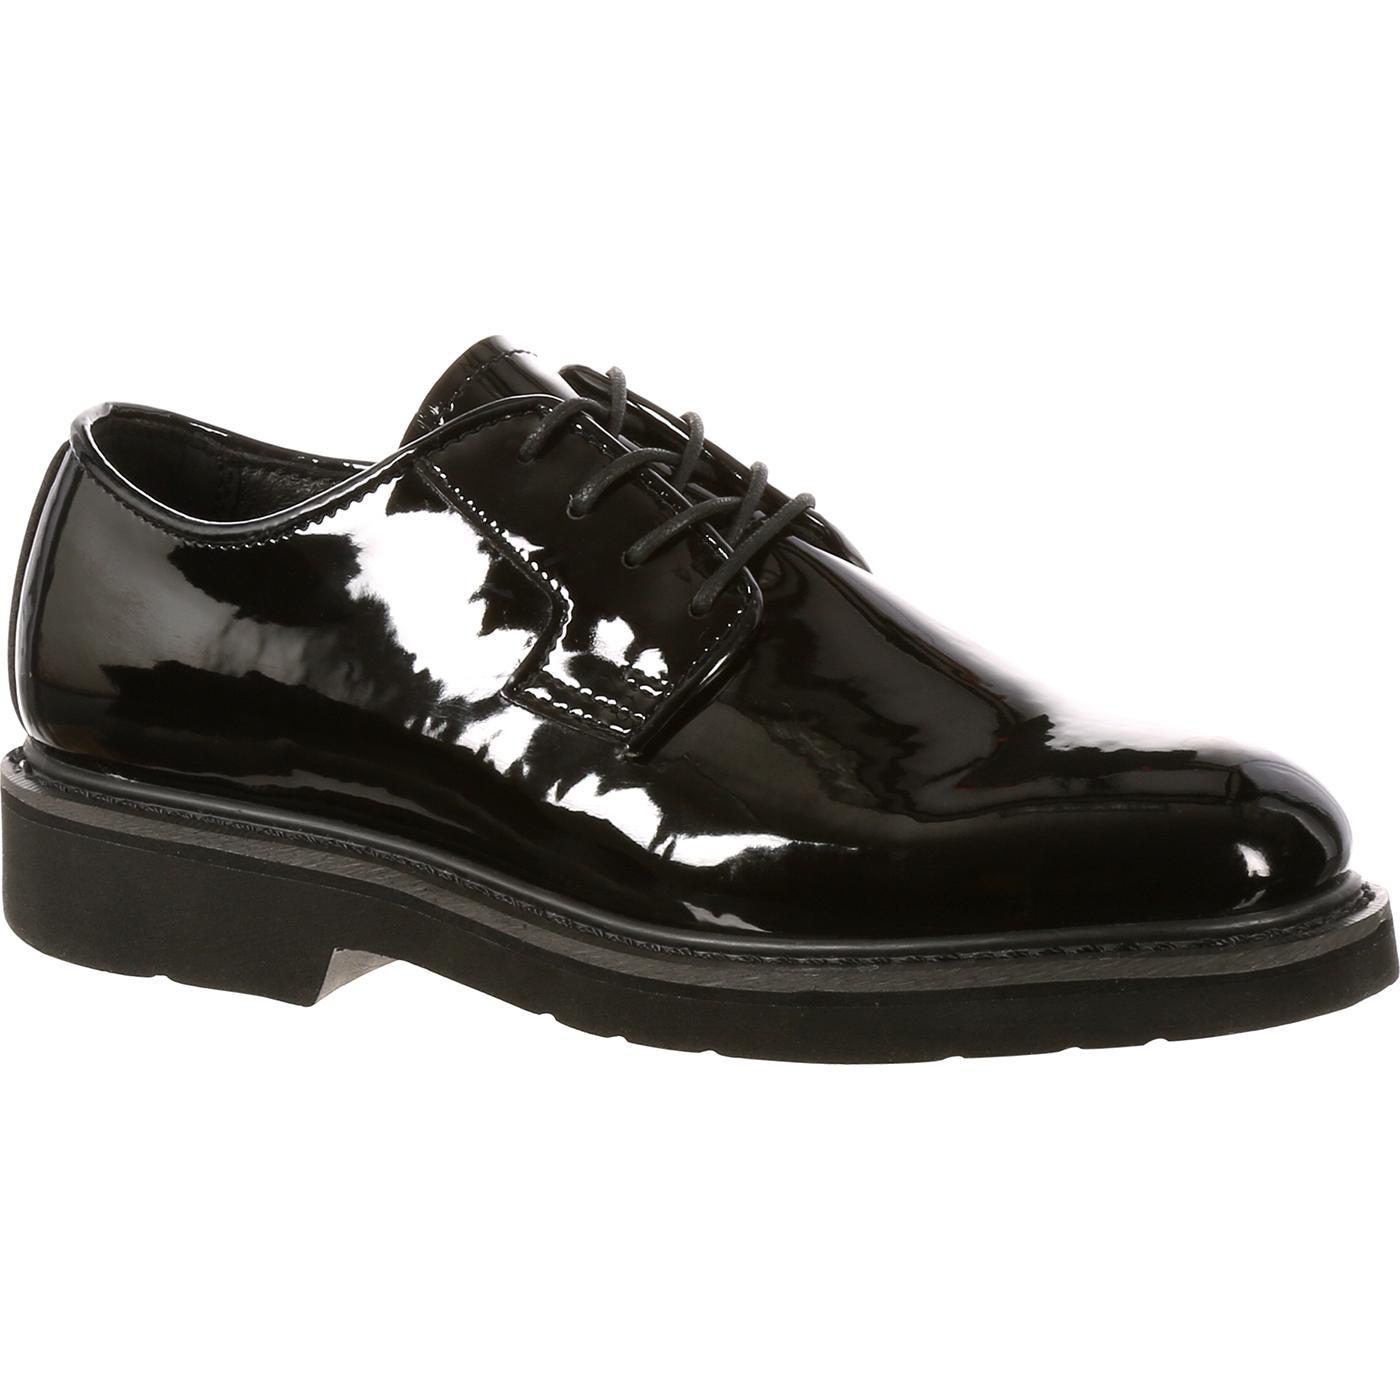 Rocky High Gloss Black Dress Leather Oxford - FQ000510-8